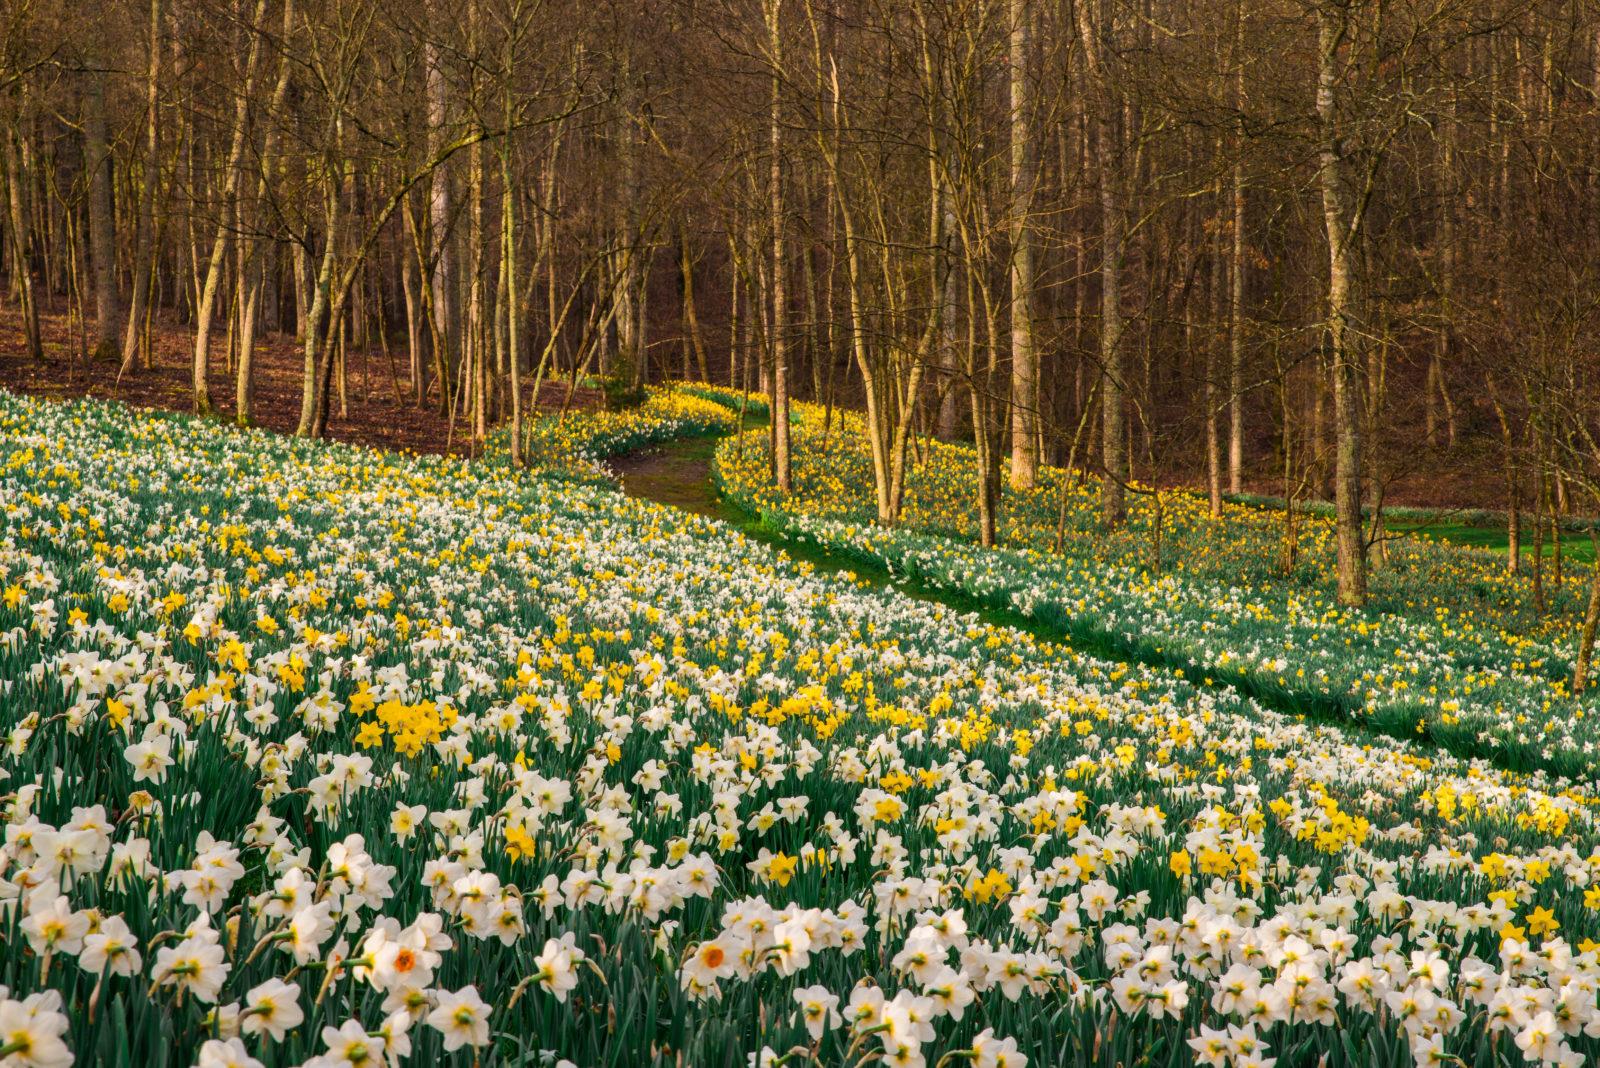 daffodils-in-morning-light-march-21-2015-david-a-e1514940804986